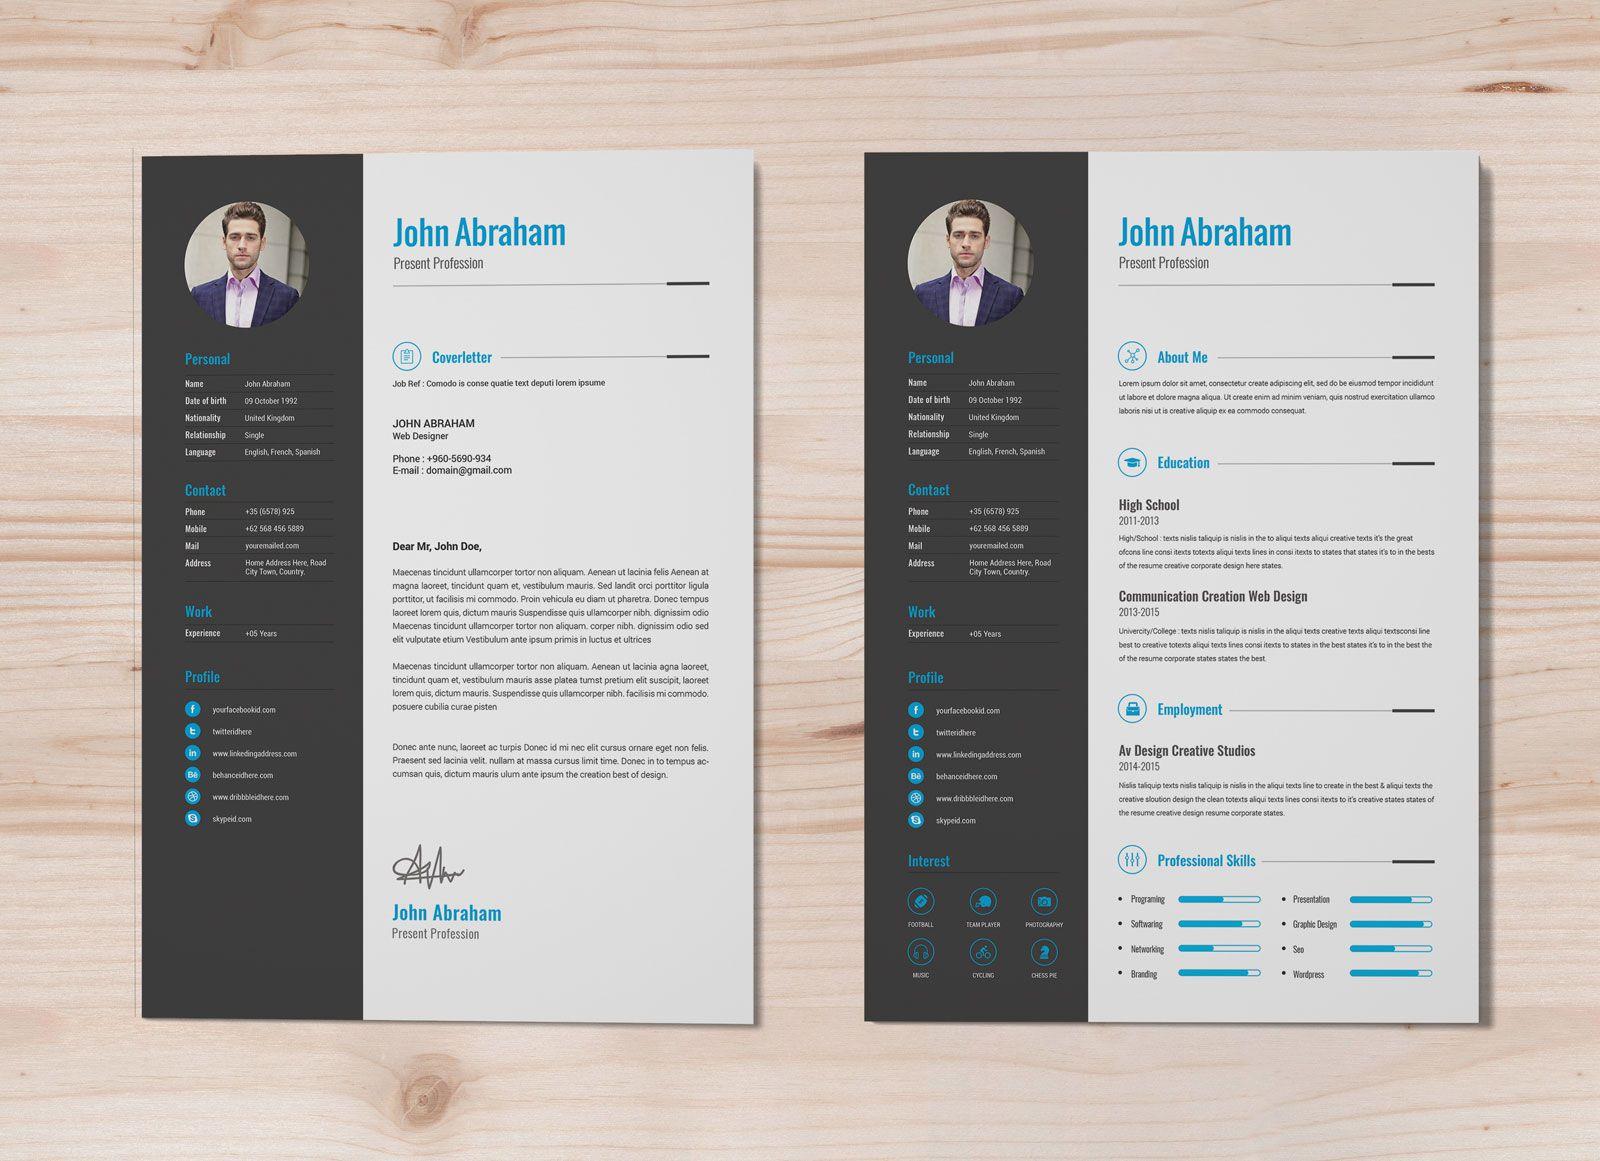 006 Stirring Cv Design Photoshop Template Free Inspiration  Resume Psd DownloadFull